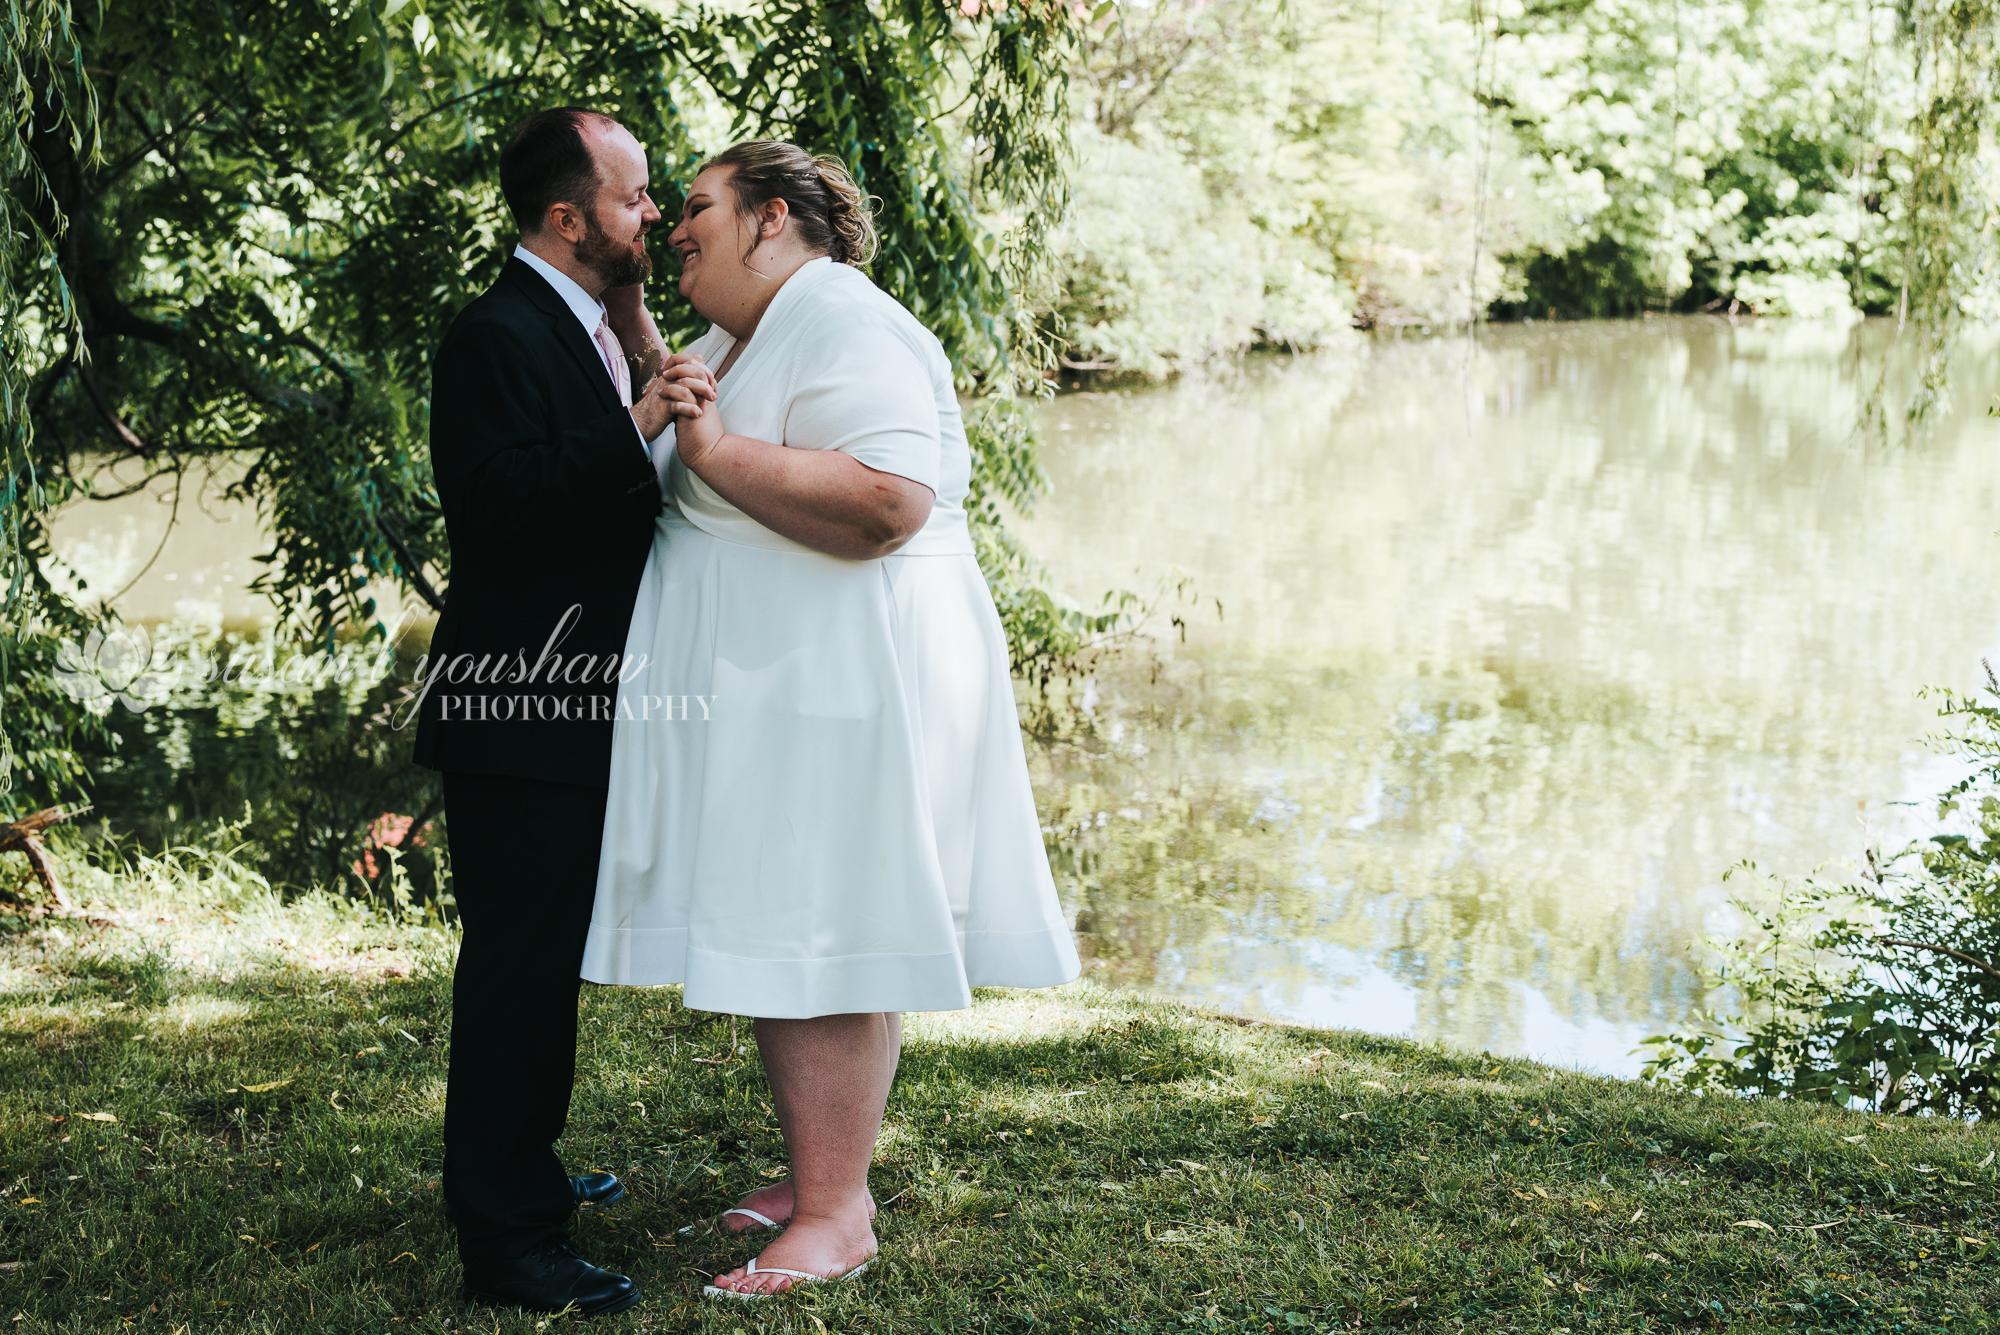 Bill and Sarah Wedding Photos 06-08-2019 SLY Photography -66.jpg